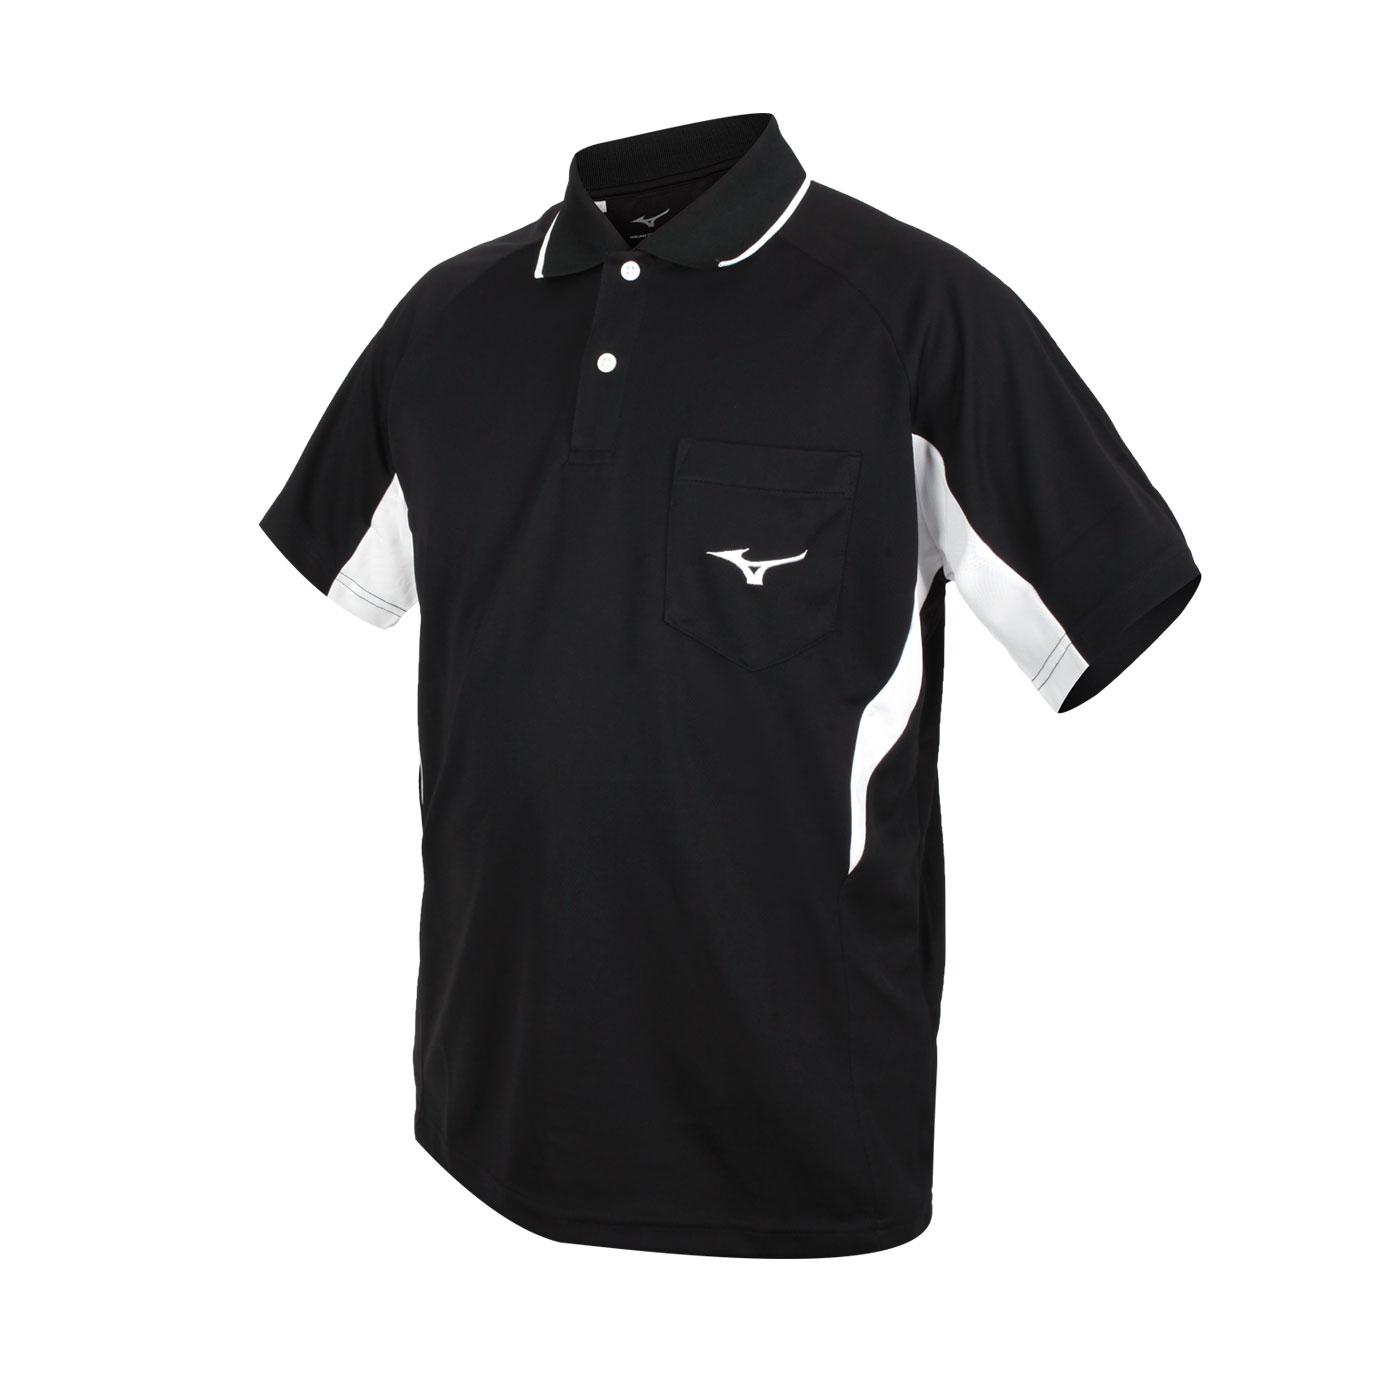 MIZUNO 男款短袖POLO衫 32TA102109 - 黑白